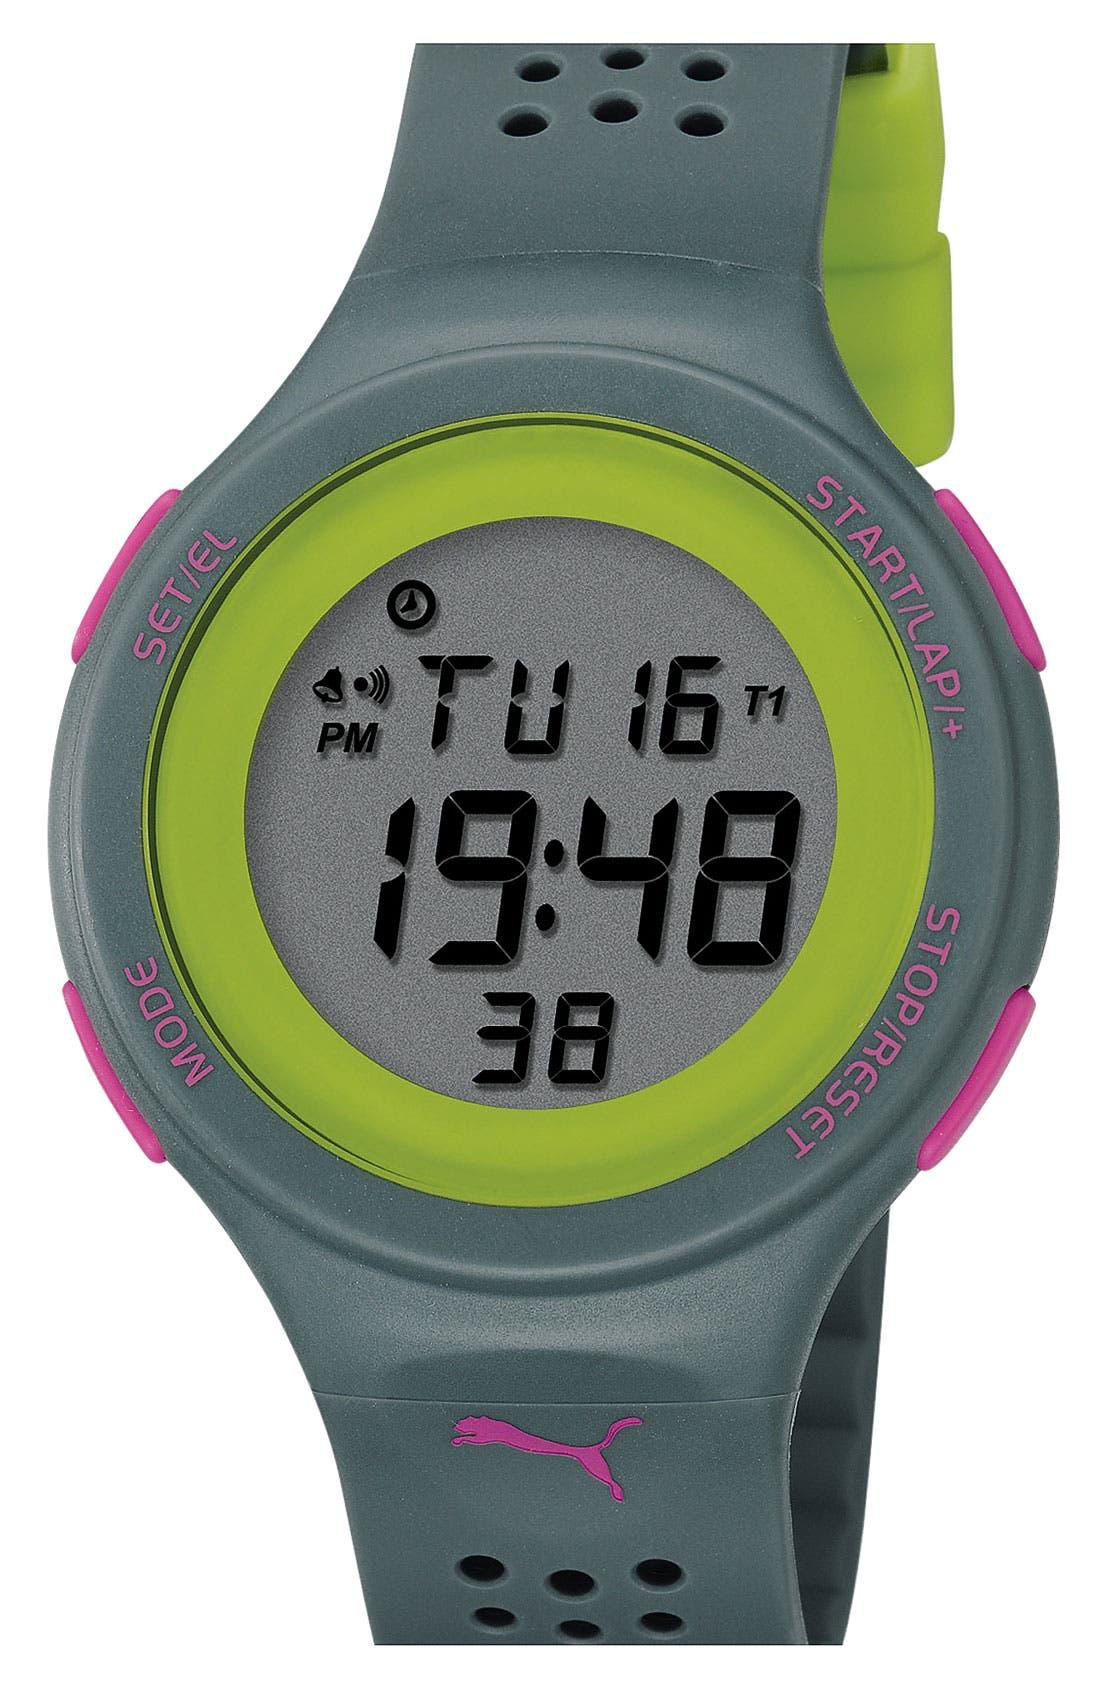 Main Image - PUMA 'Faas 200' Digital Sport Watch, 44mm